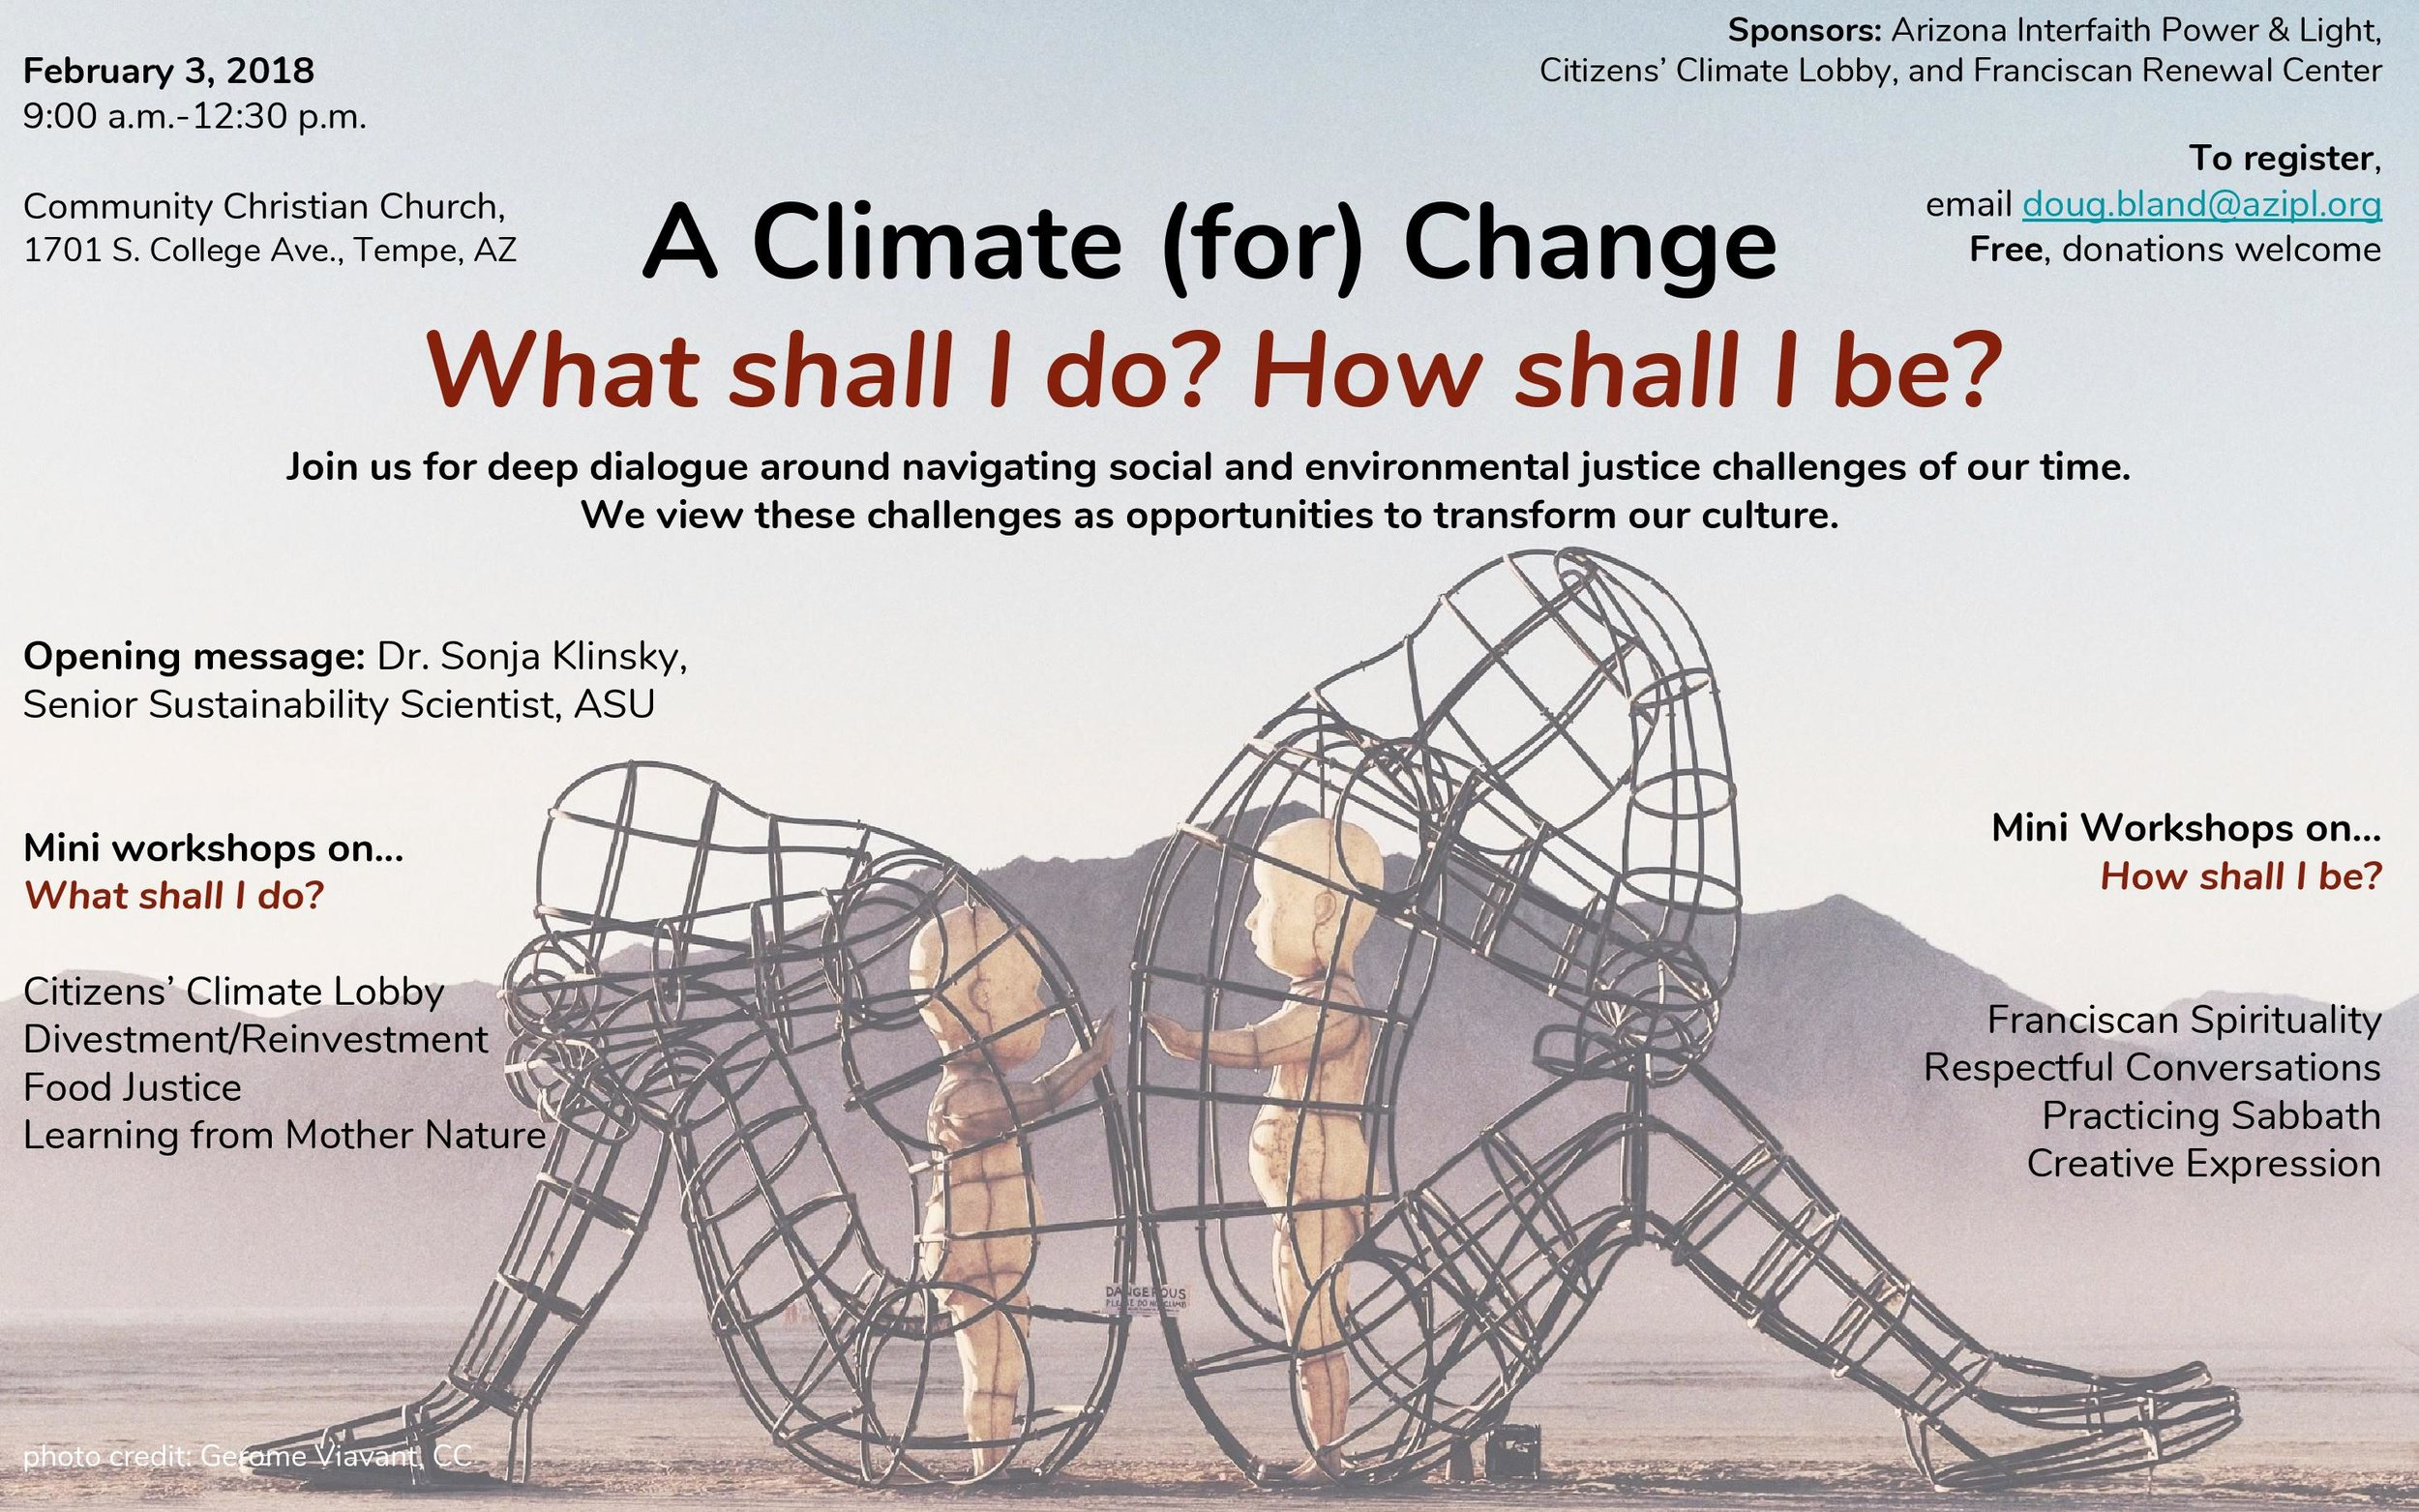 climate for change flyer.jpg